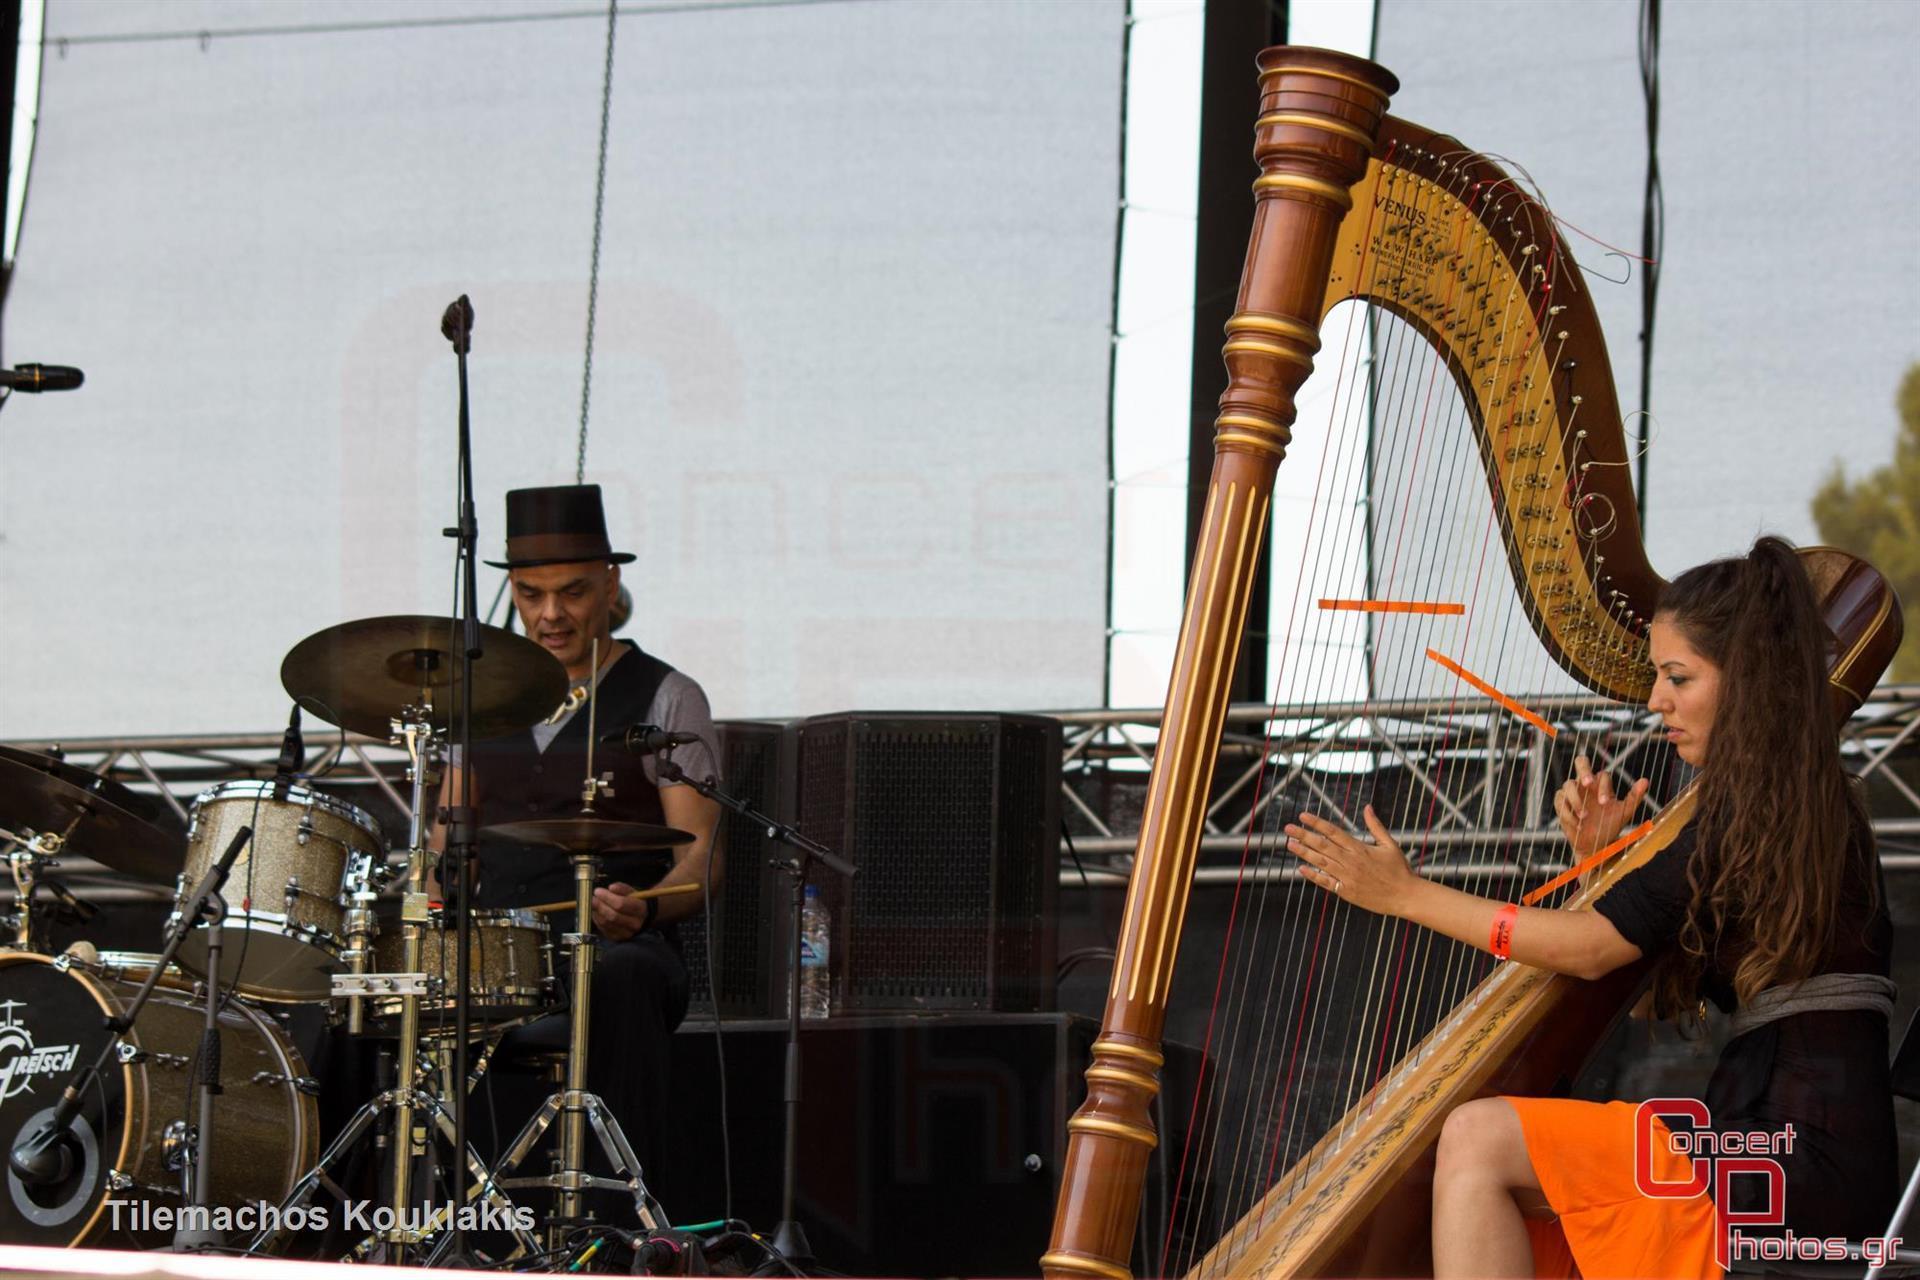 Opera Chaotique-Opera Chaotique photographer: Tilemachos Kouklakis - concertphotos_-0025